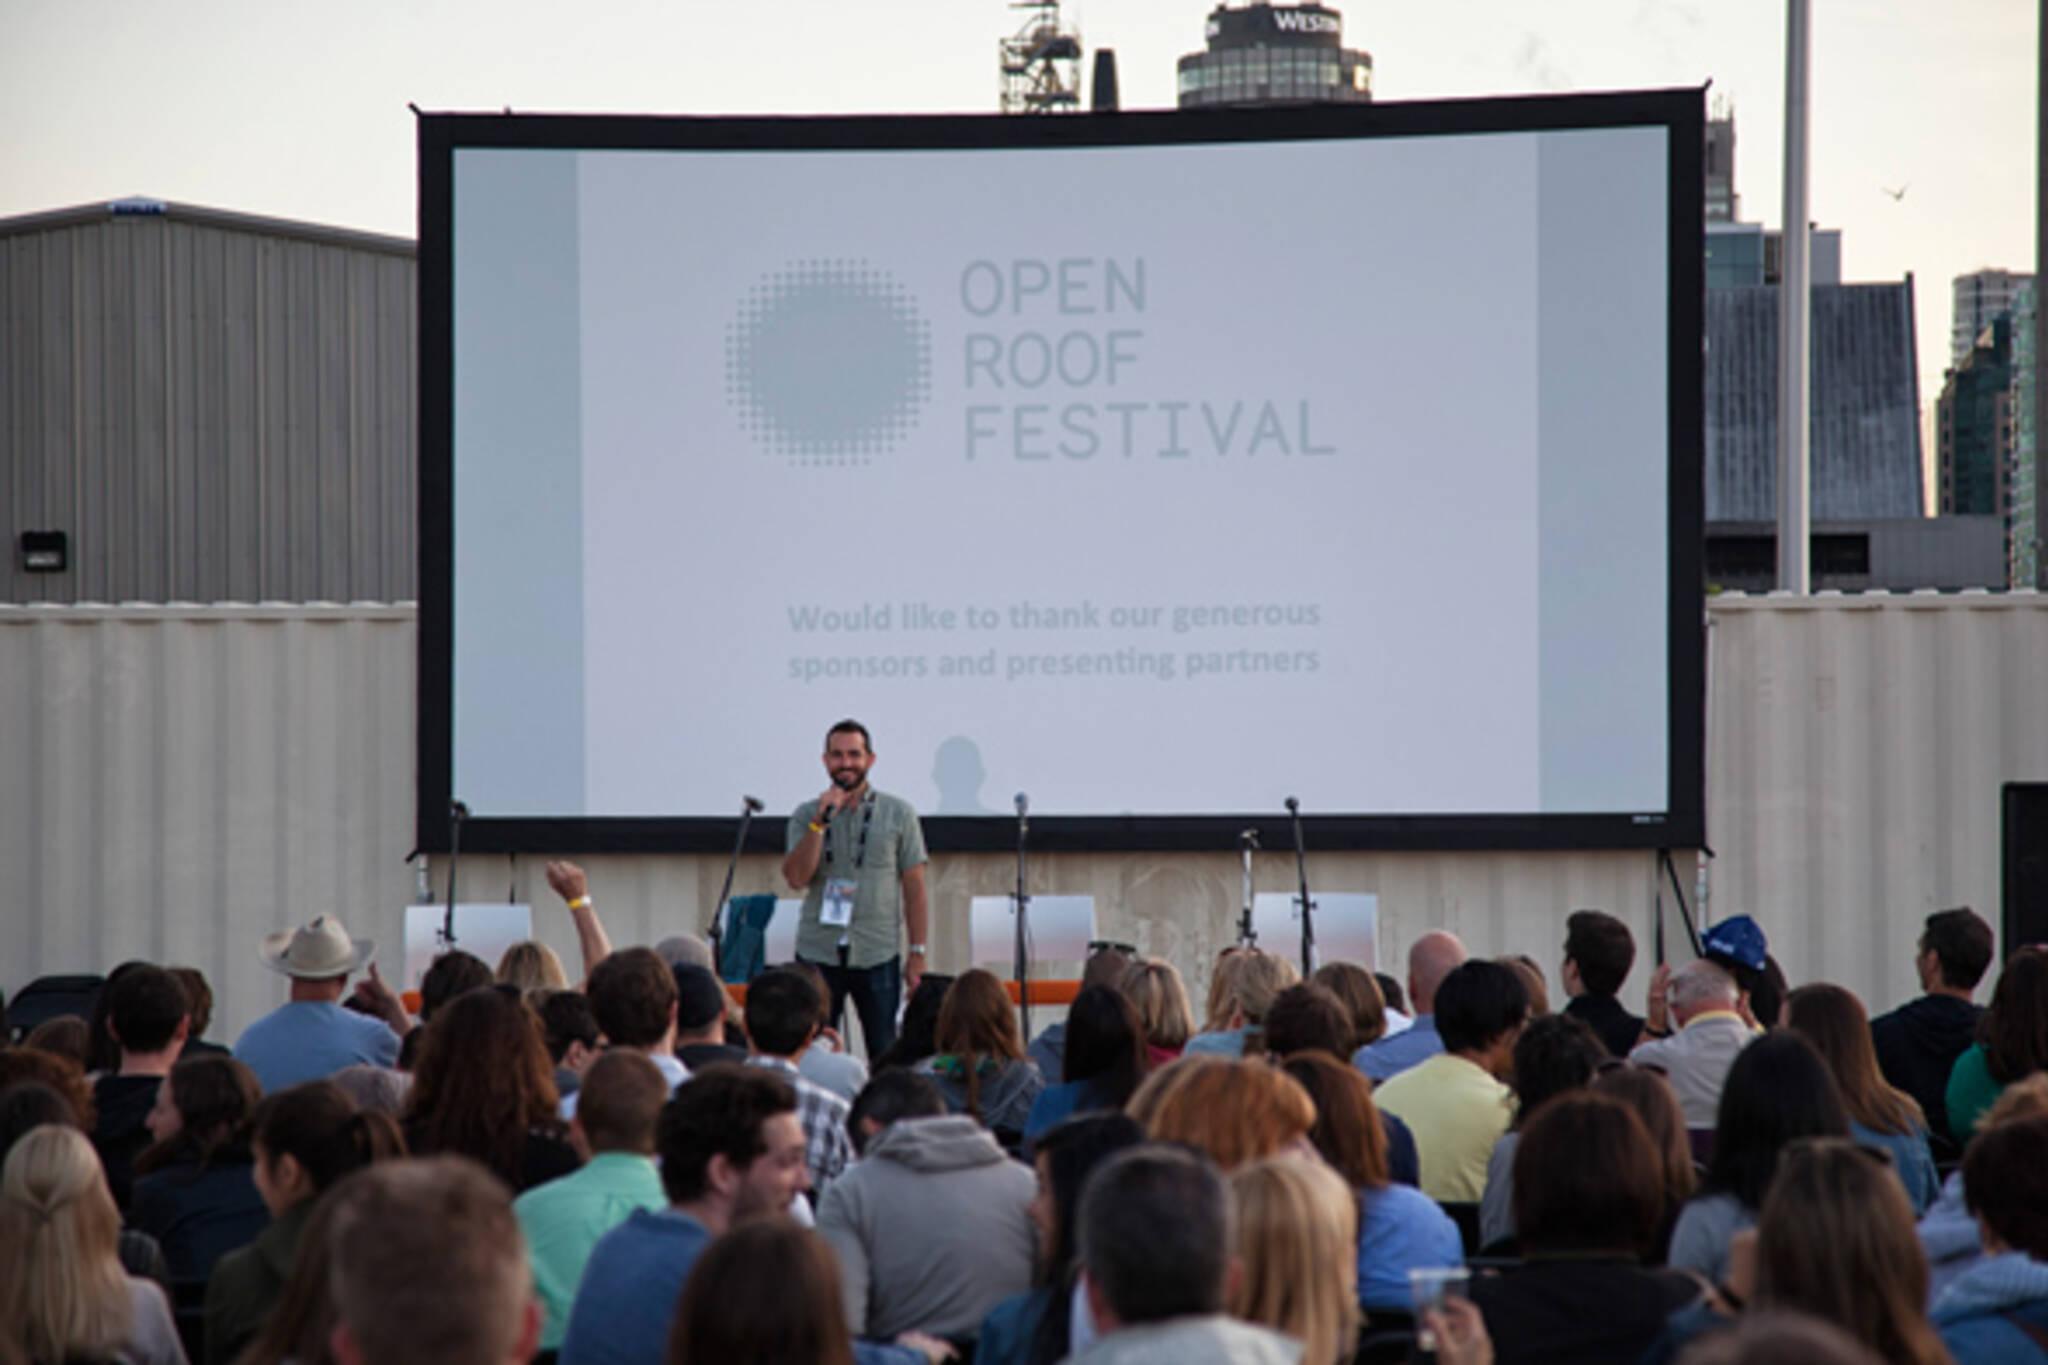 Open Roof Festival